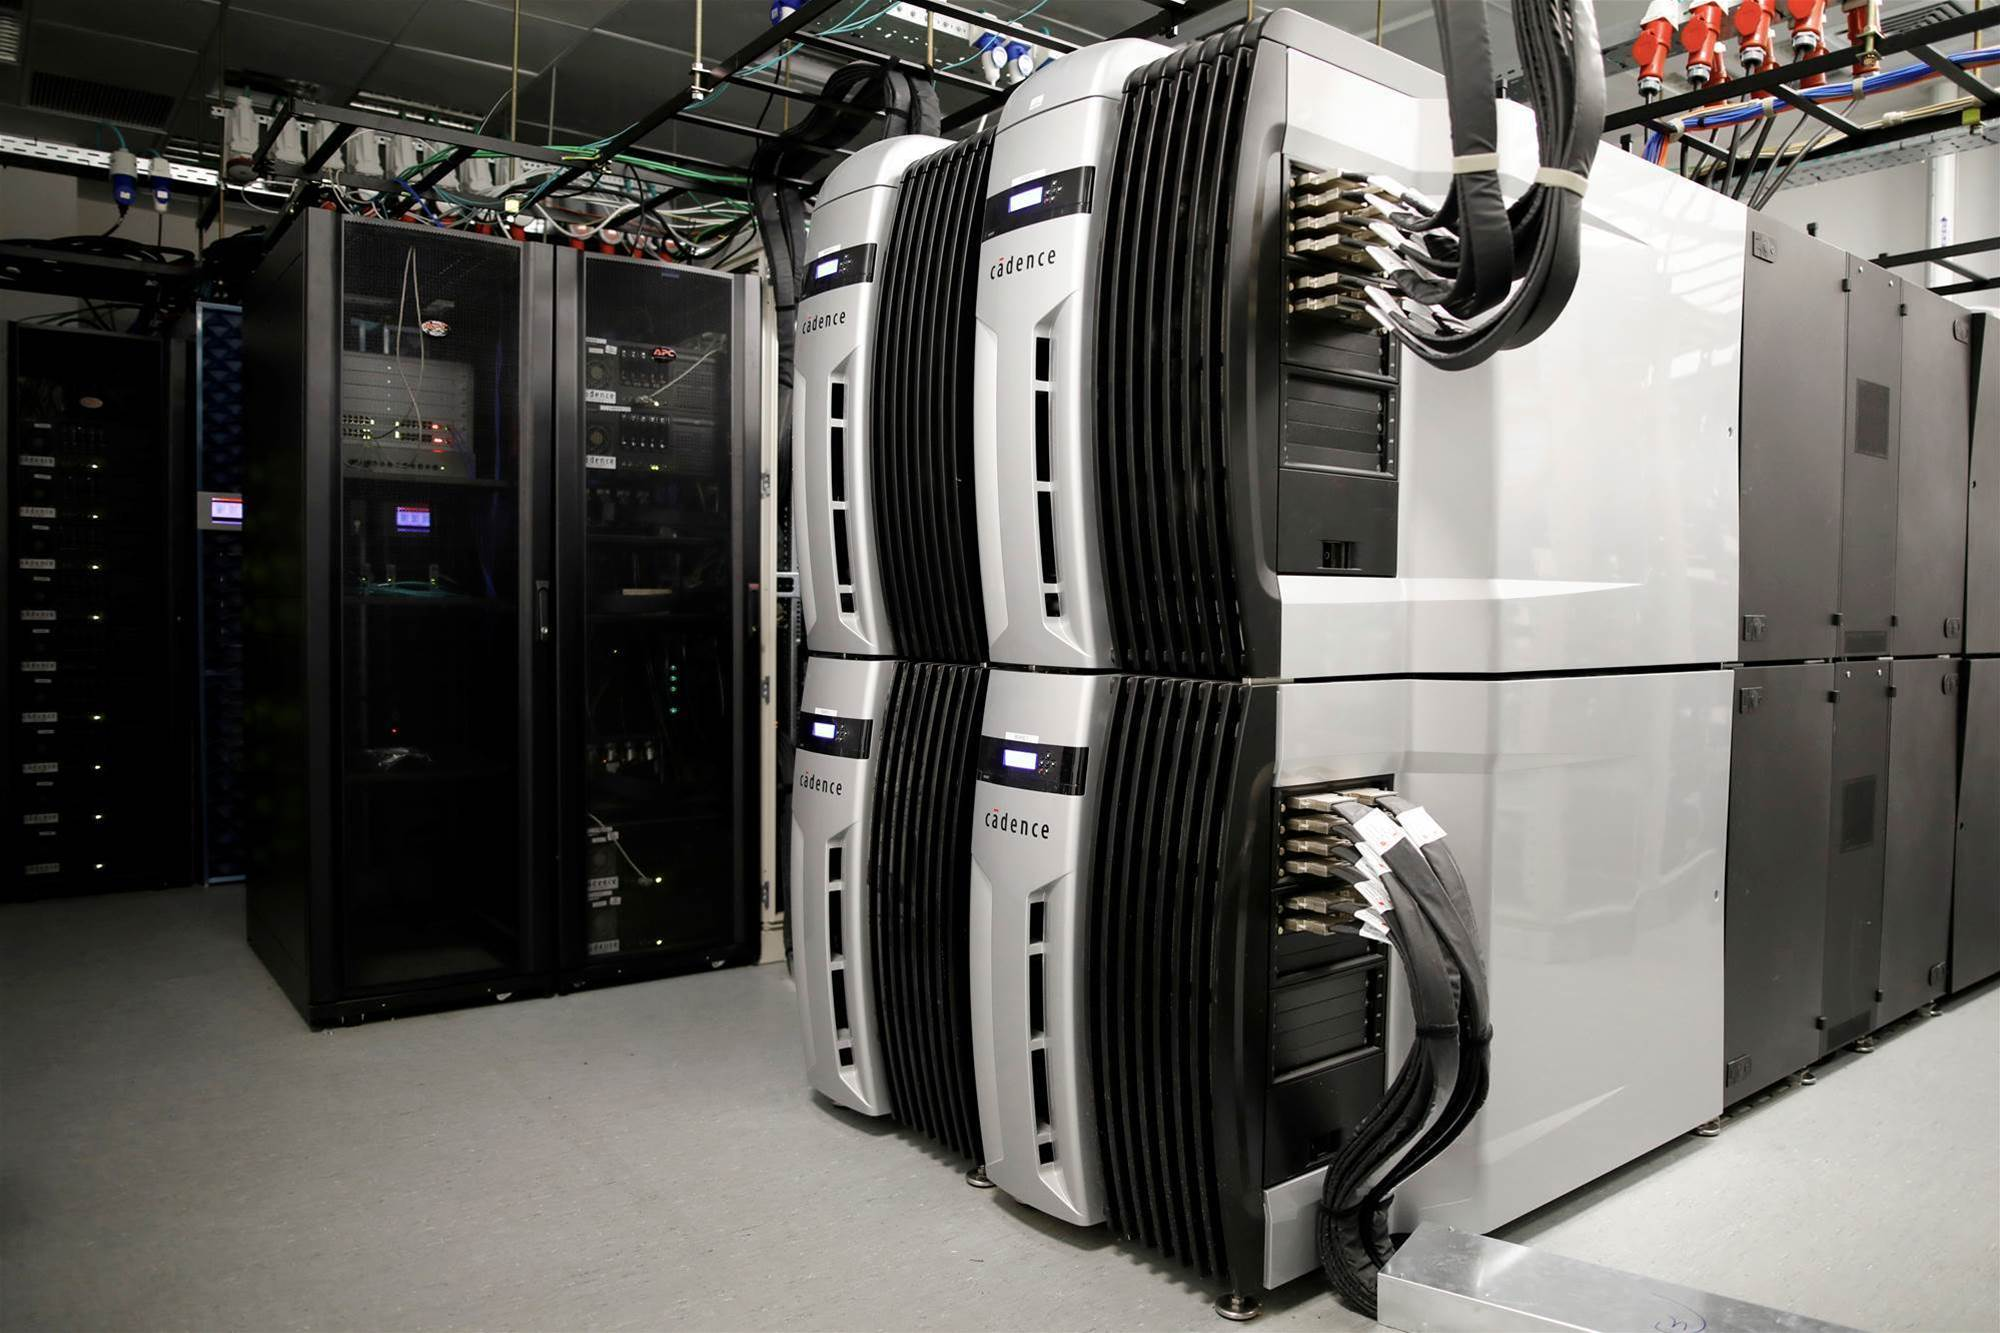 Nvidia signals data centre push after Mellanox buy